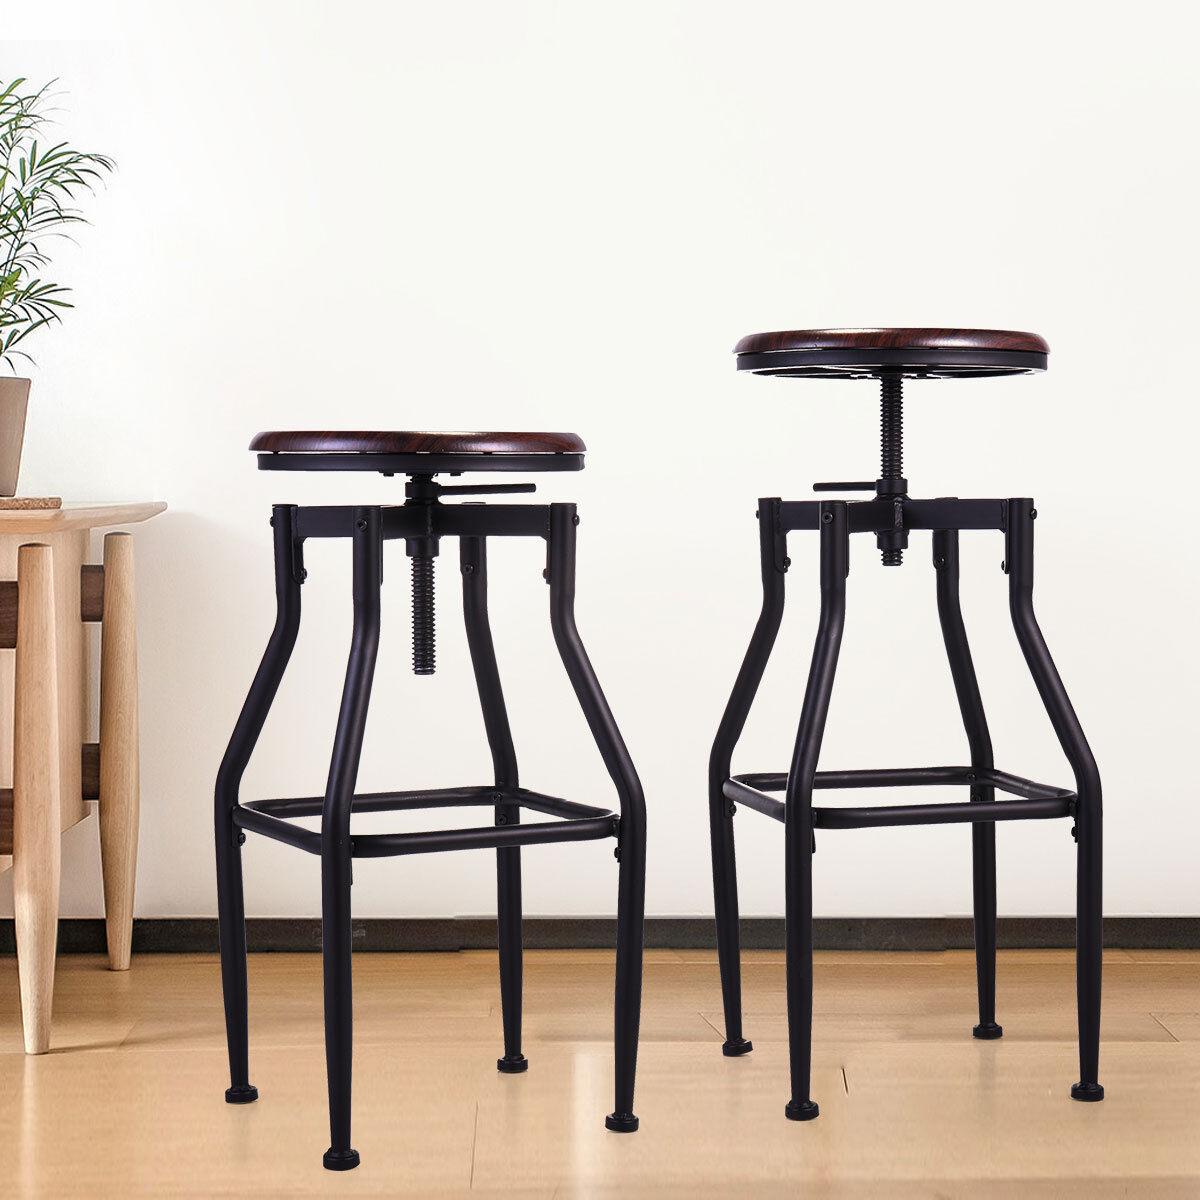 Set of 2 Bar Stool Industrial Metal Design Wood Top Adjustab